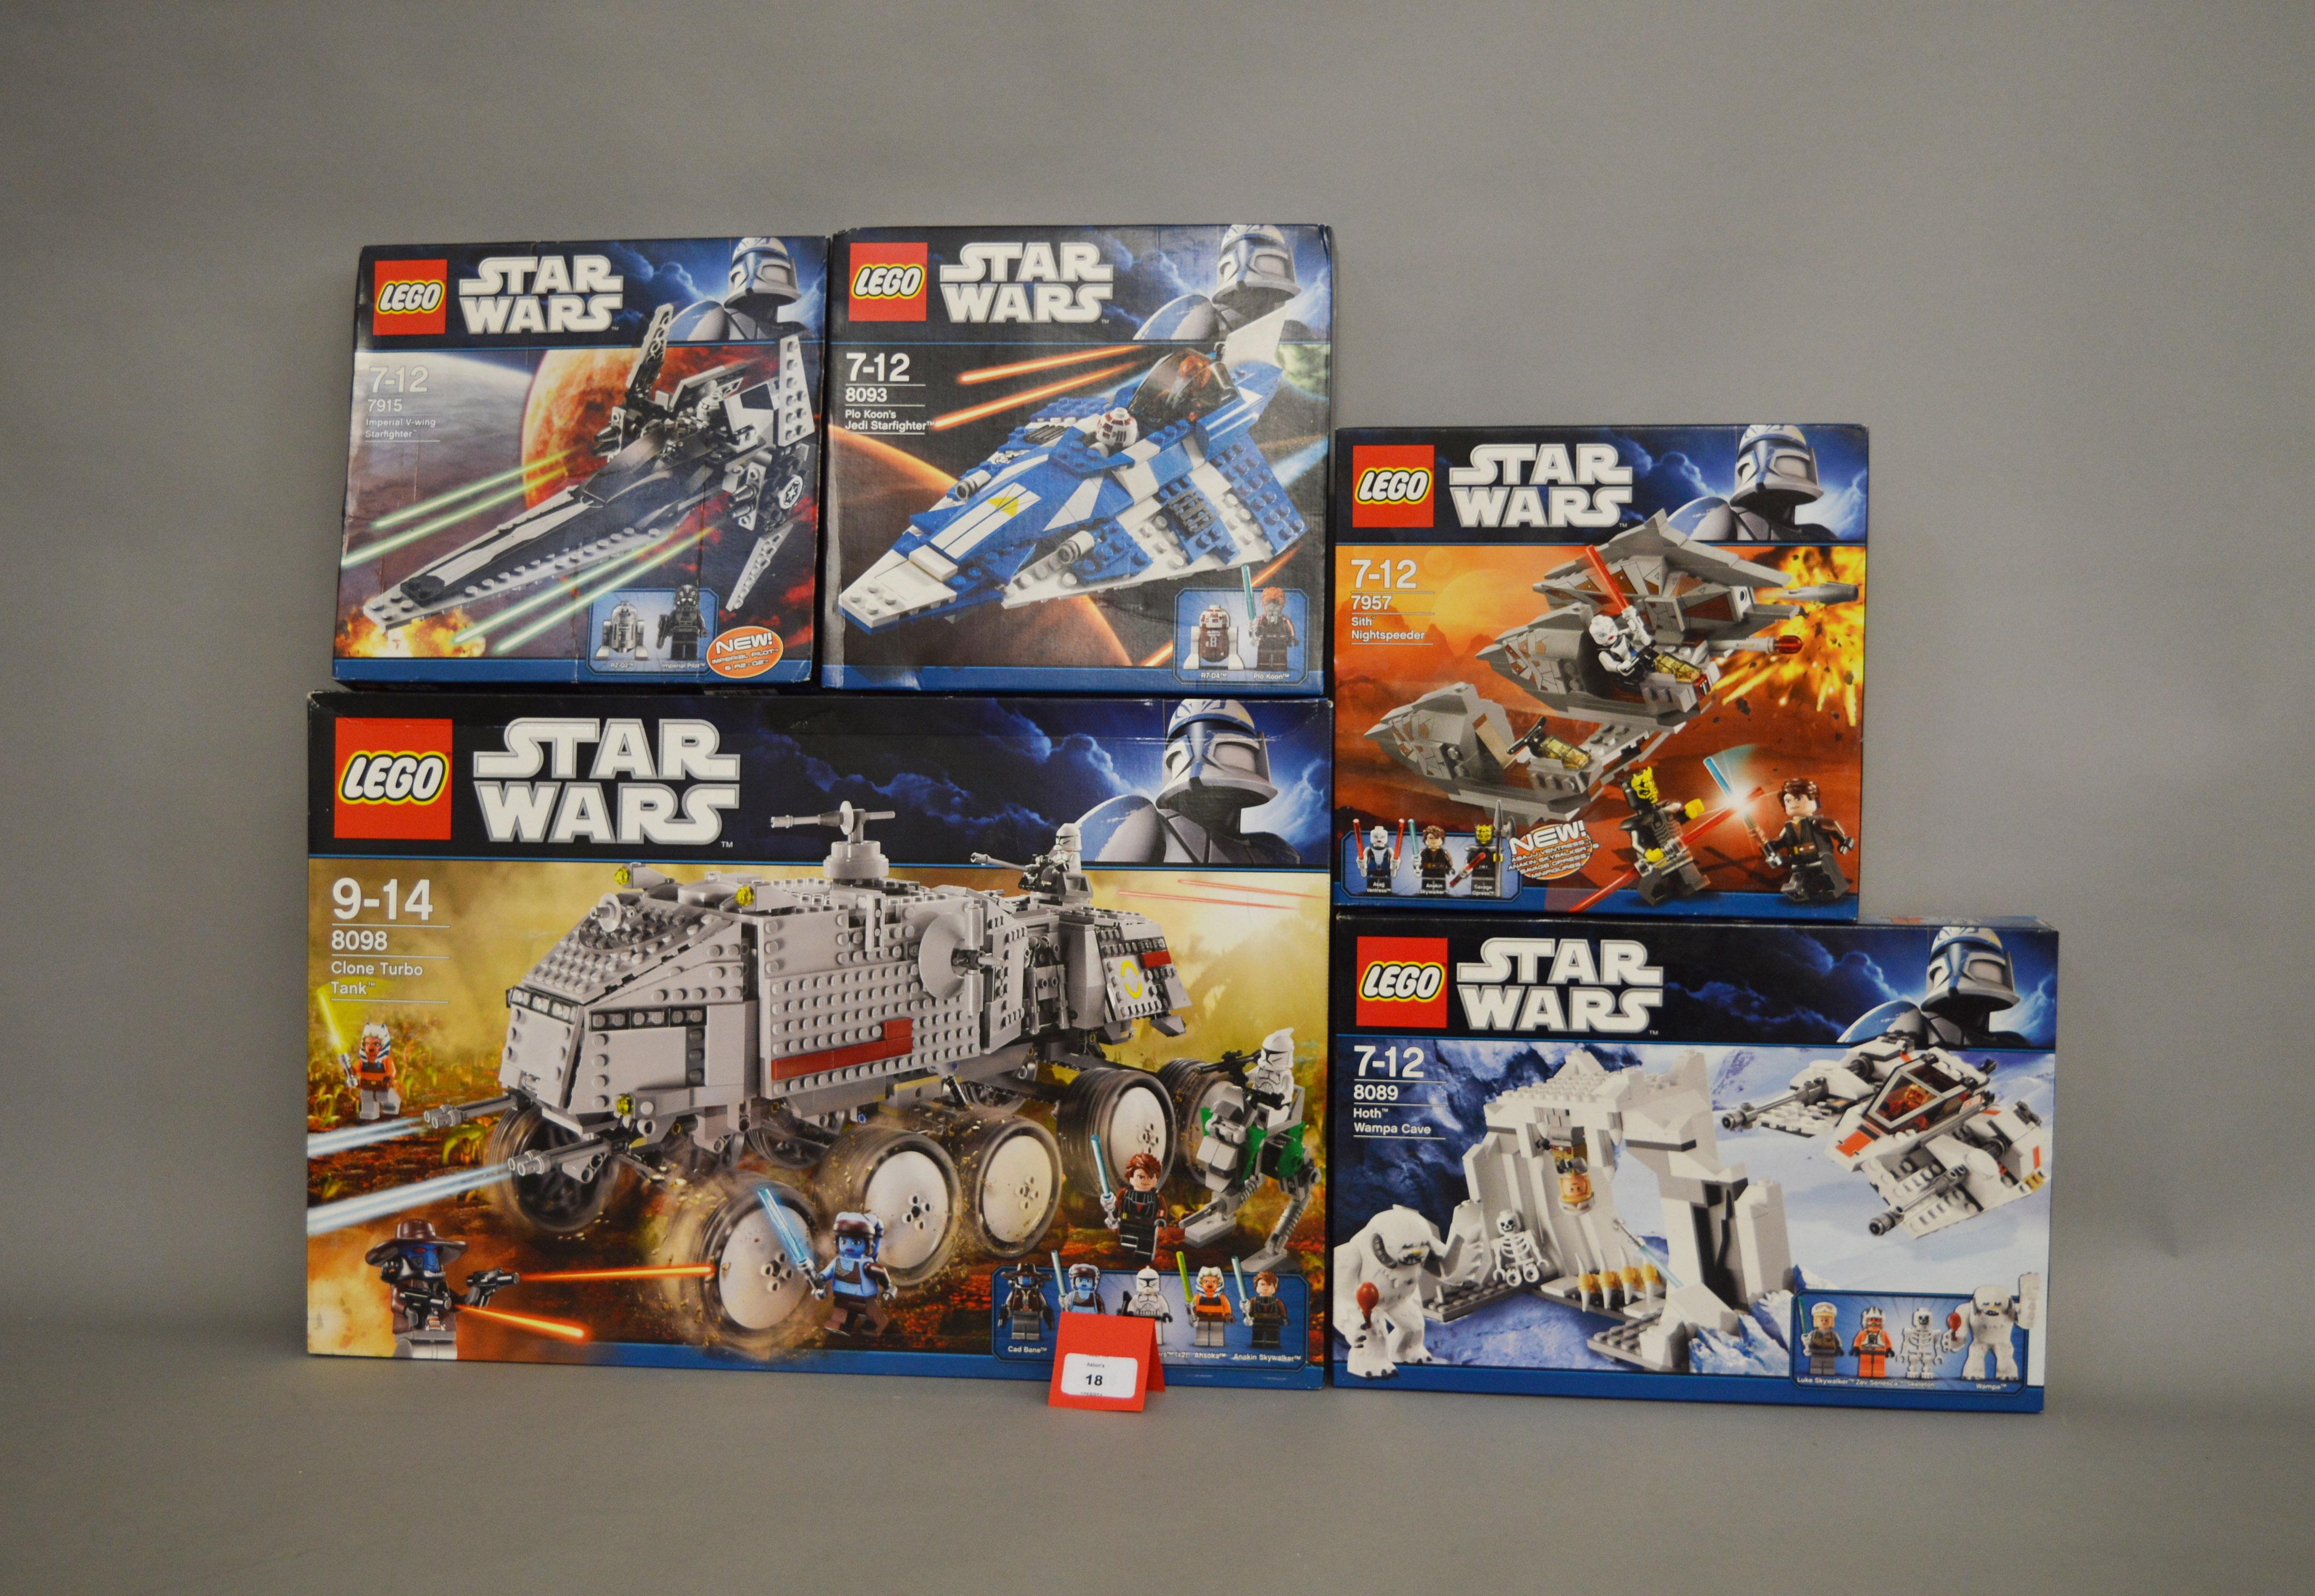 Lot 18 - Five Lego Star Wars sets: 8098 Clone Turbo Tank; 8089 Hoth Wampa Cave; 7957 Sith Nightspeeder;